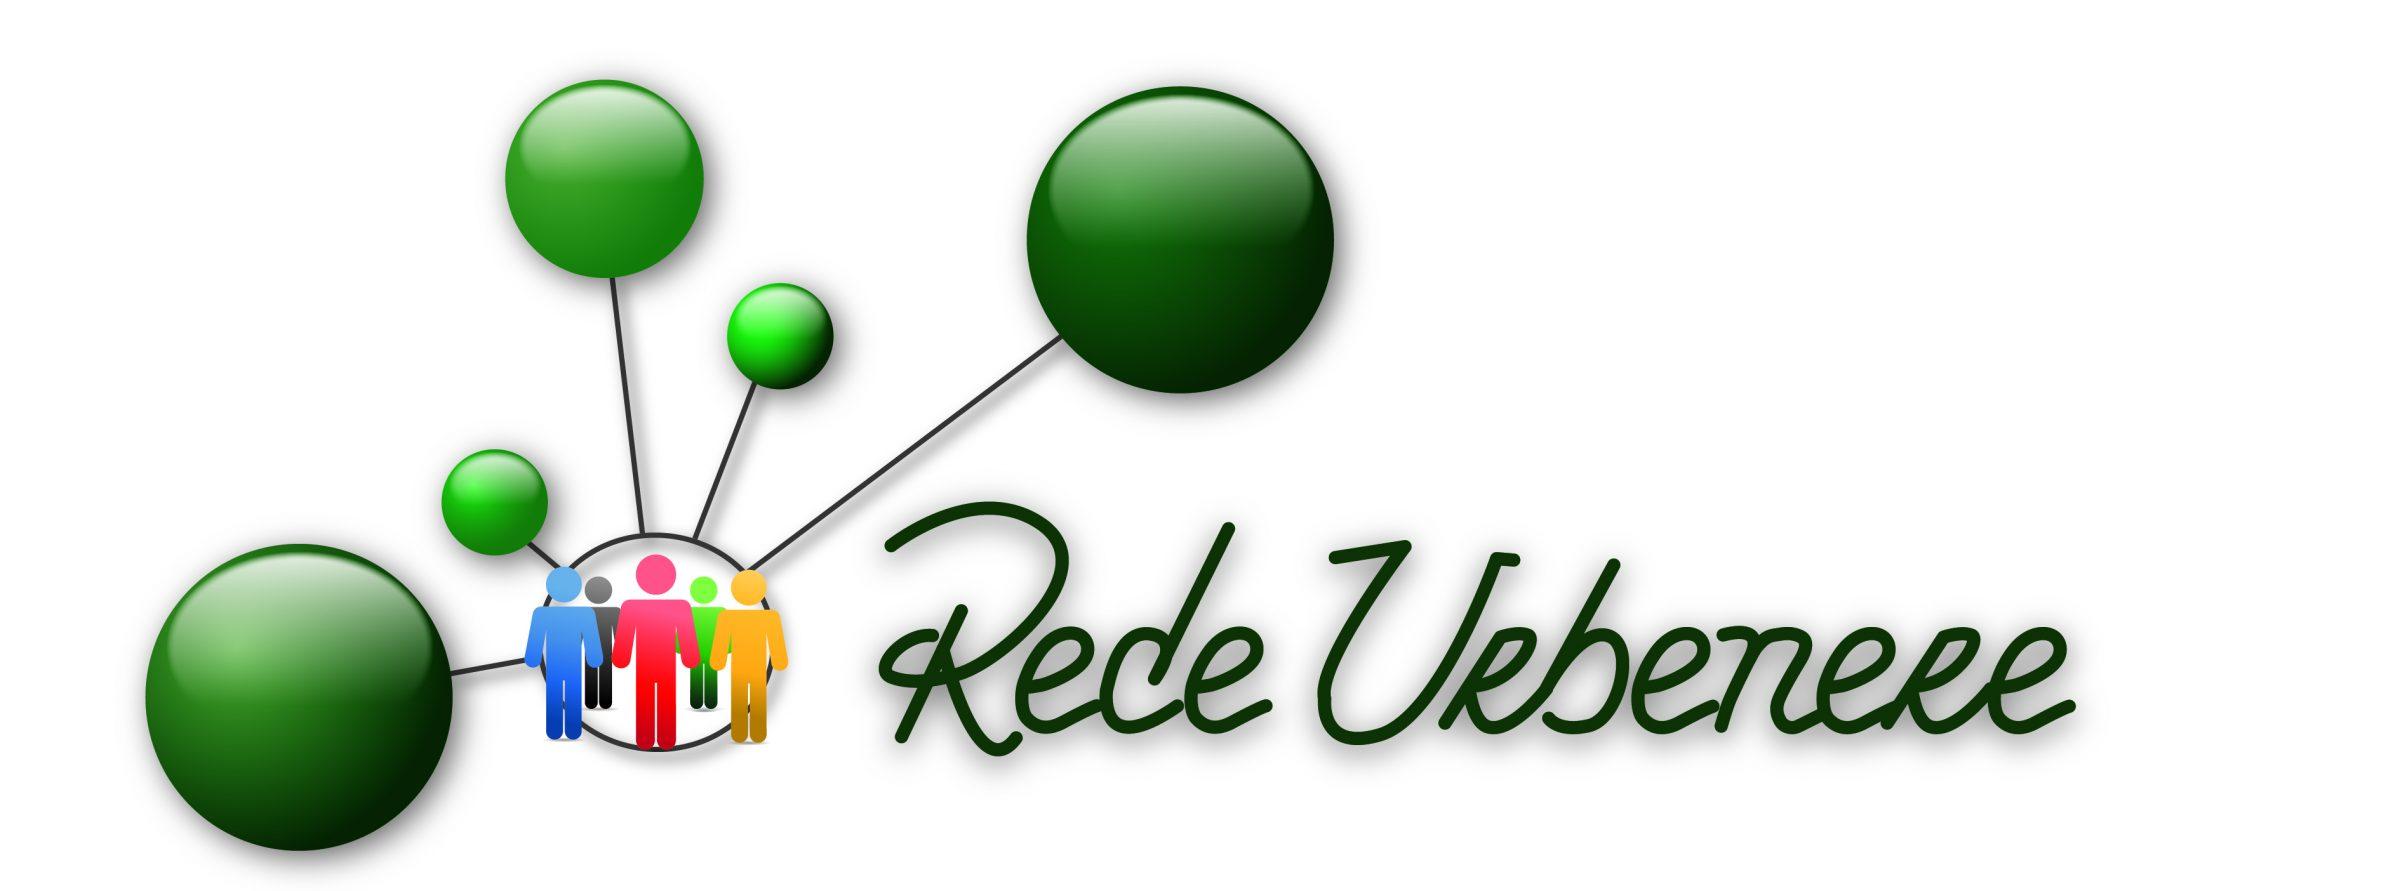 URBENERE - Logo